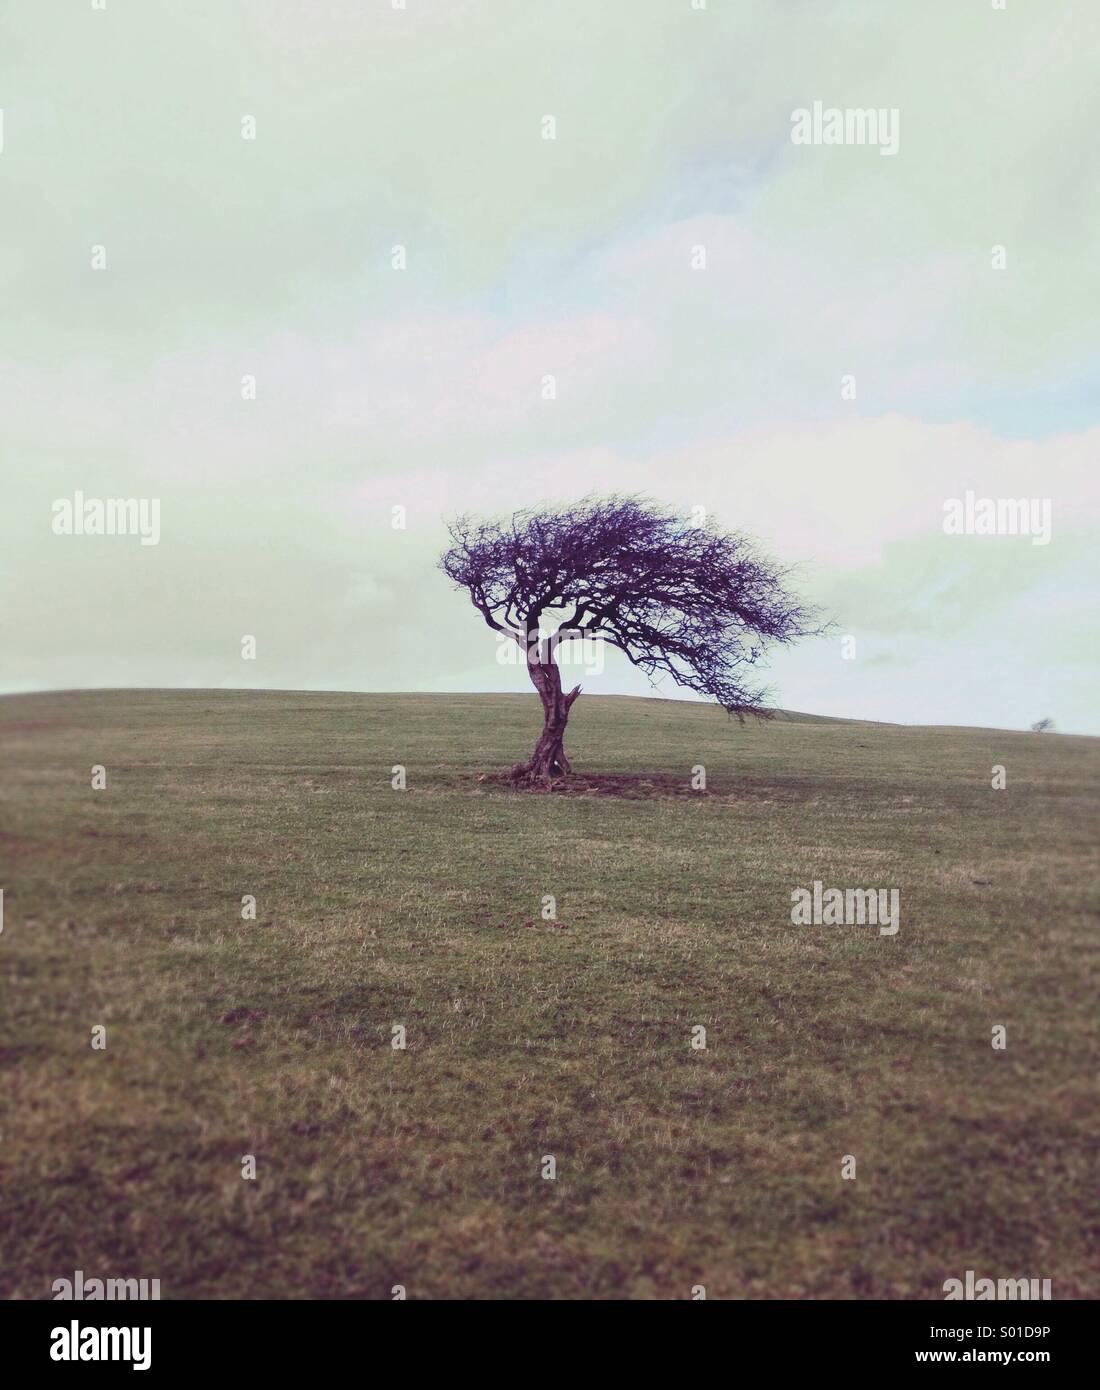 A windswept tree - Stock Image